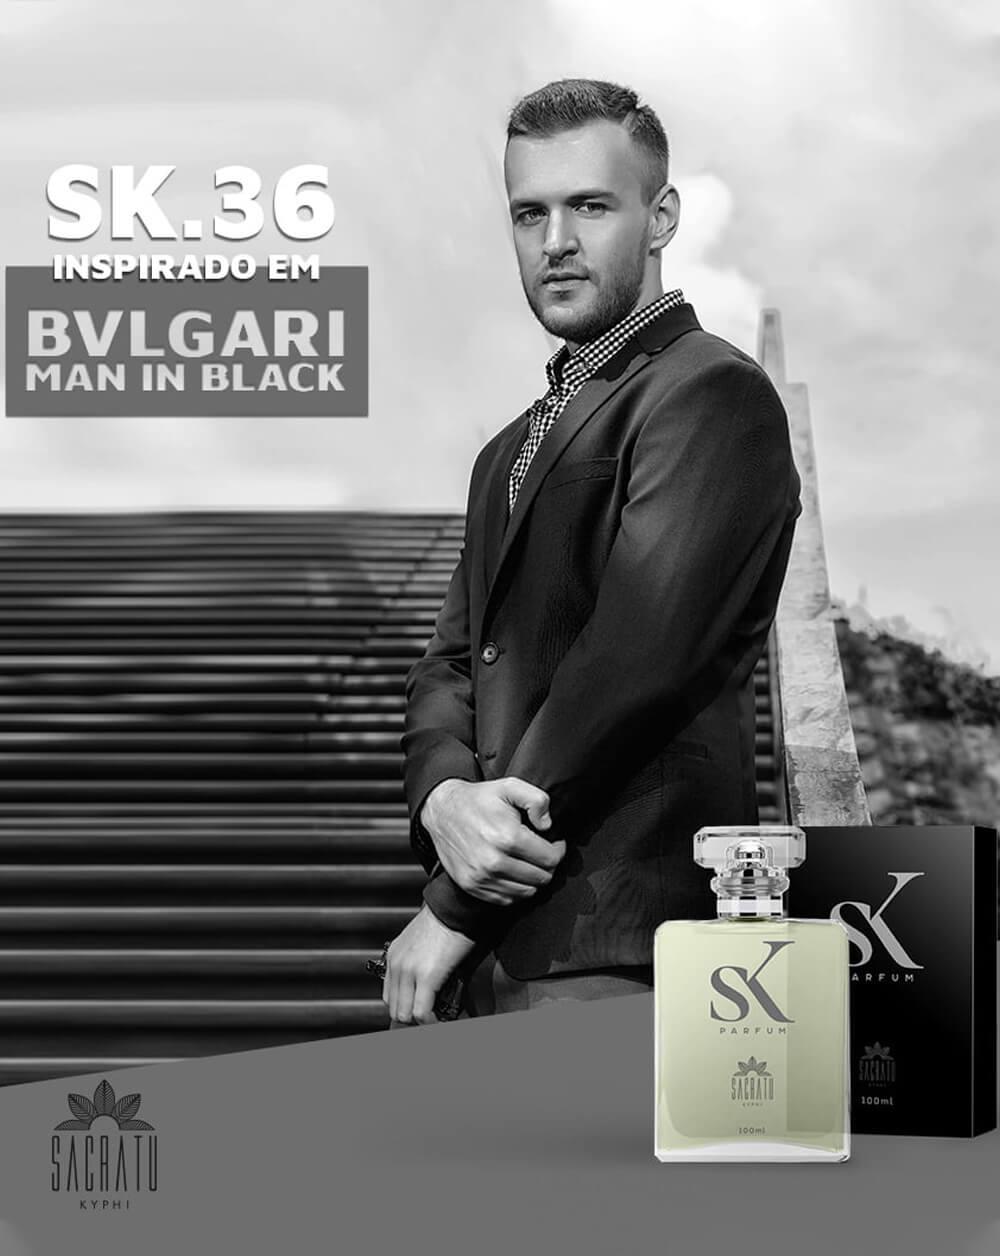 SK 36 - Inspirado no Bvlgari Man in Black by Bvlgari